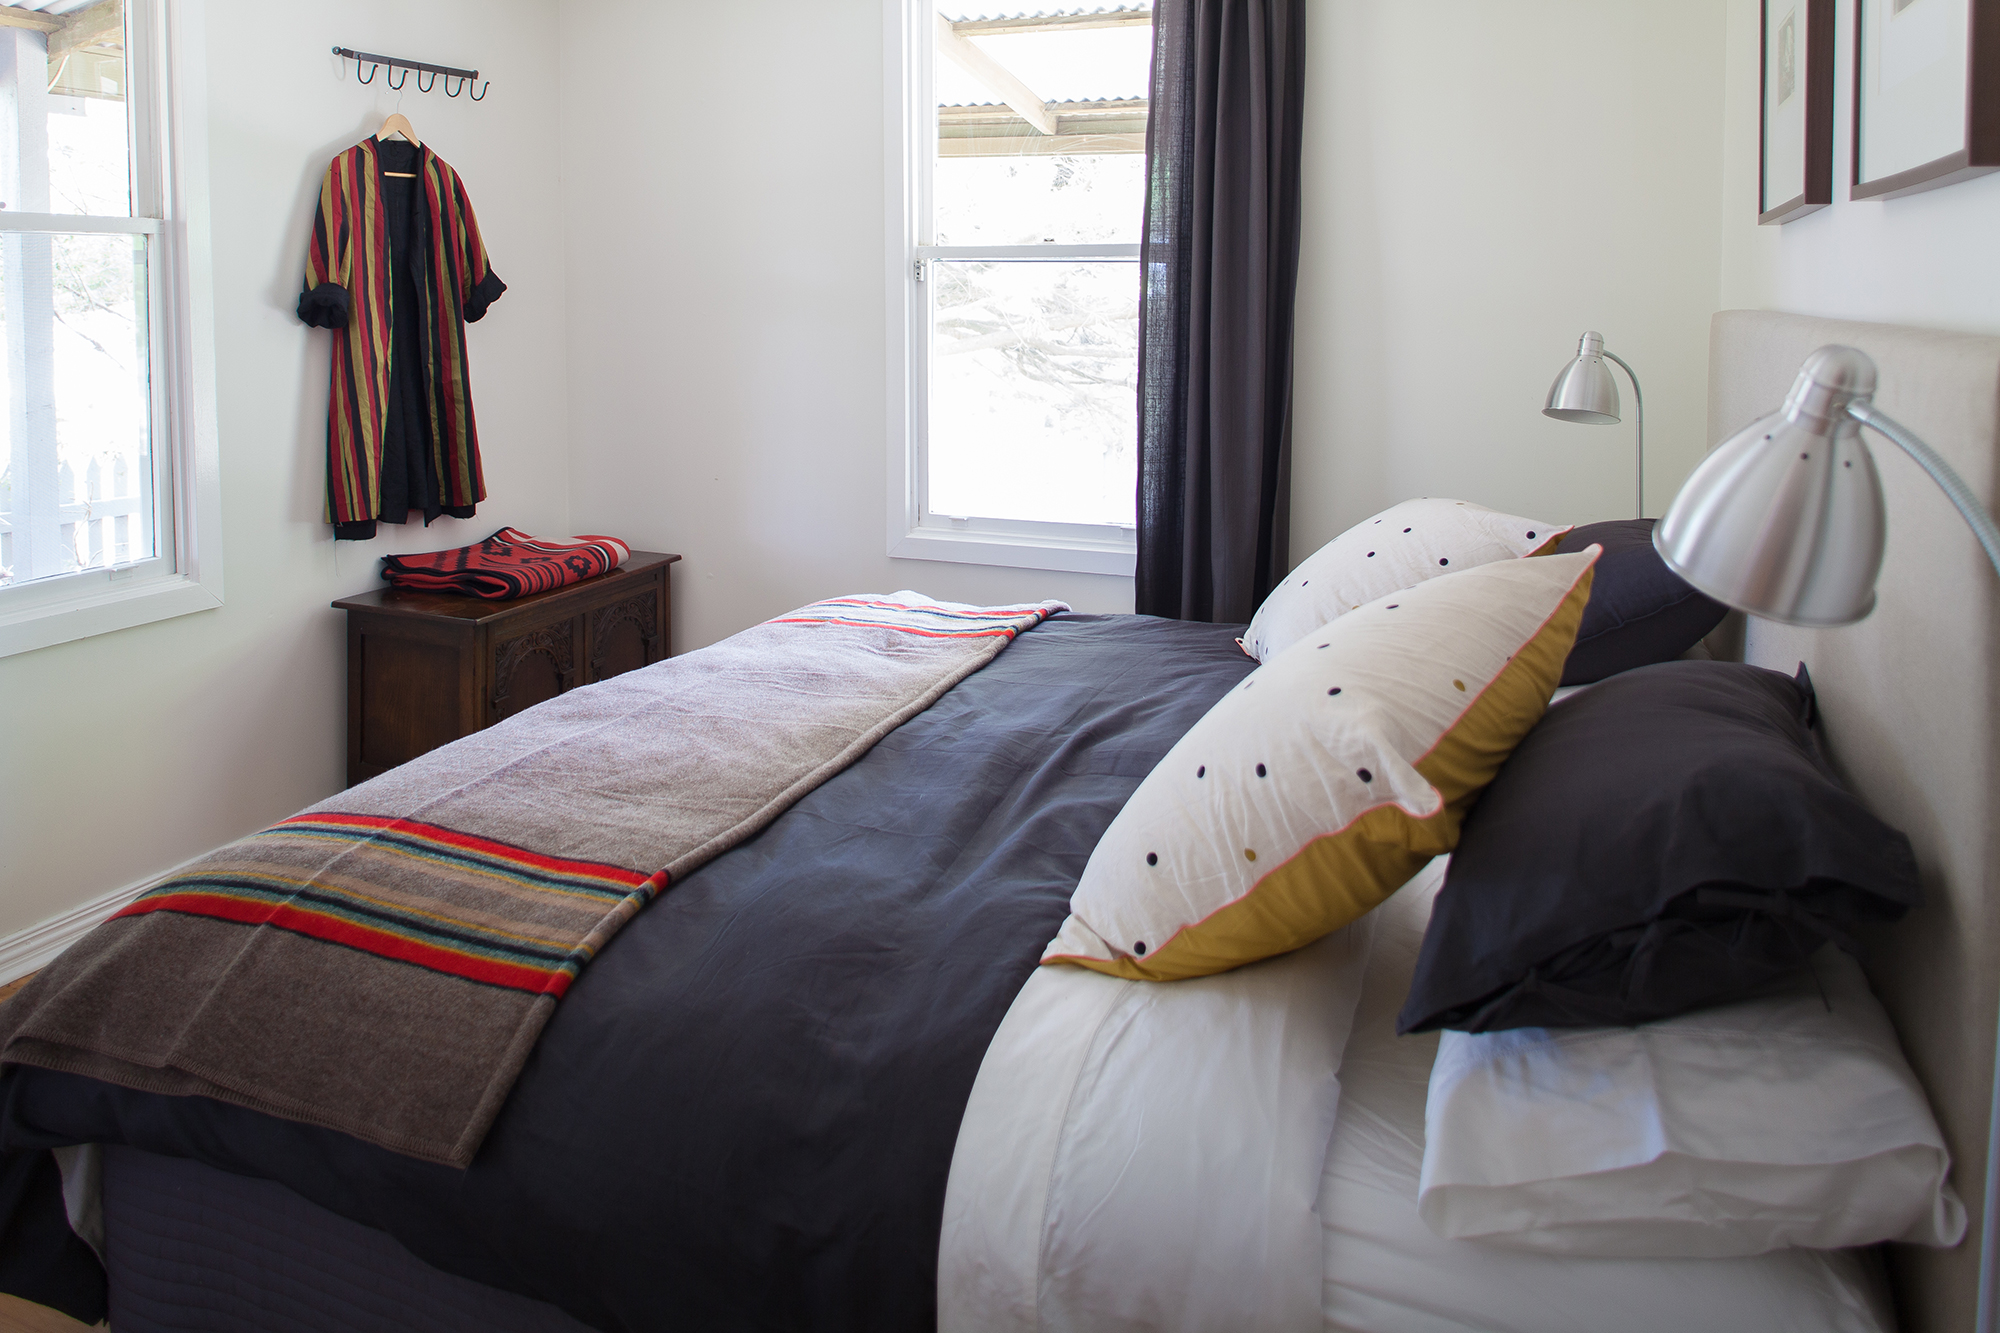 106-Deep-Lead-Lane-King-bed-horizontal-v2-copy-2.jpg